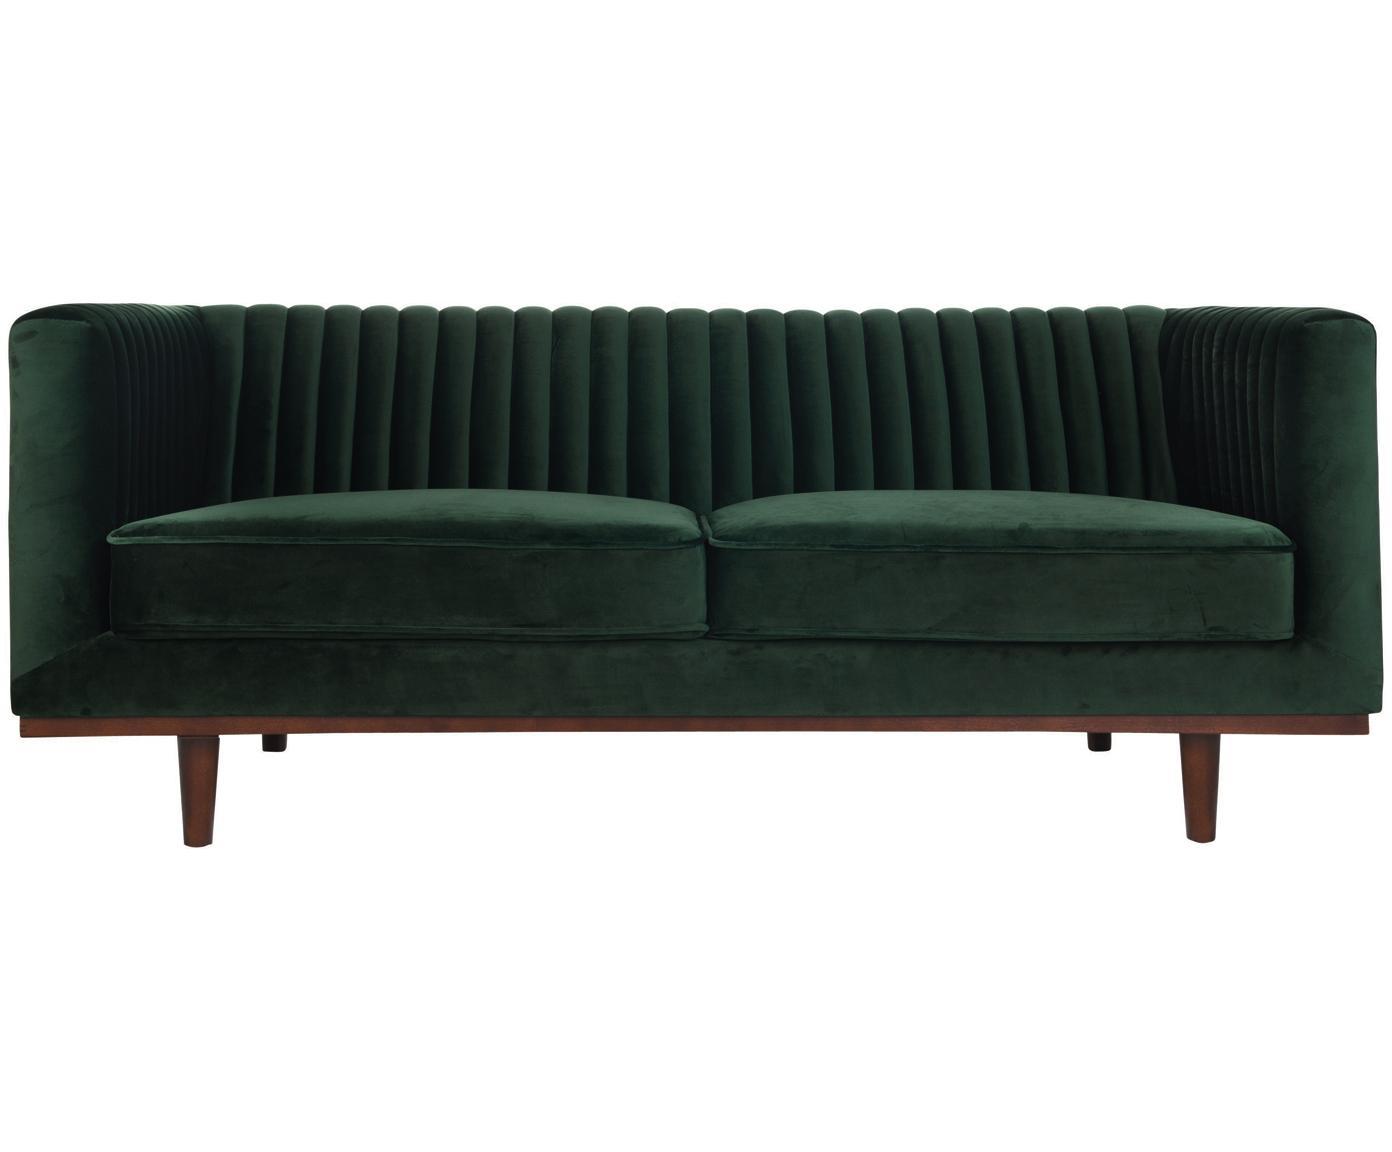 Samt-Sofa Dante (2-Sitzer), Bezug: Polyestersamt, Gestell: Kautschukbaumholz, klarla, Samt Grün, B 174 x T 87 cm